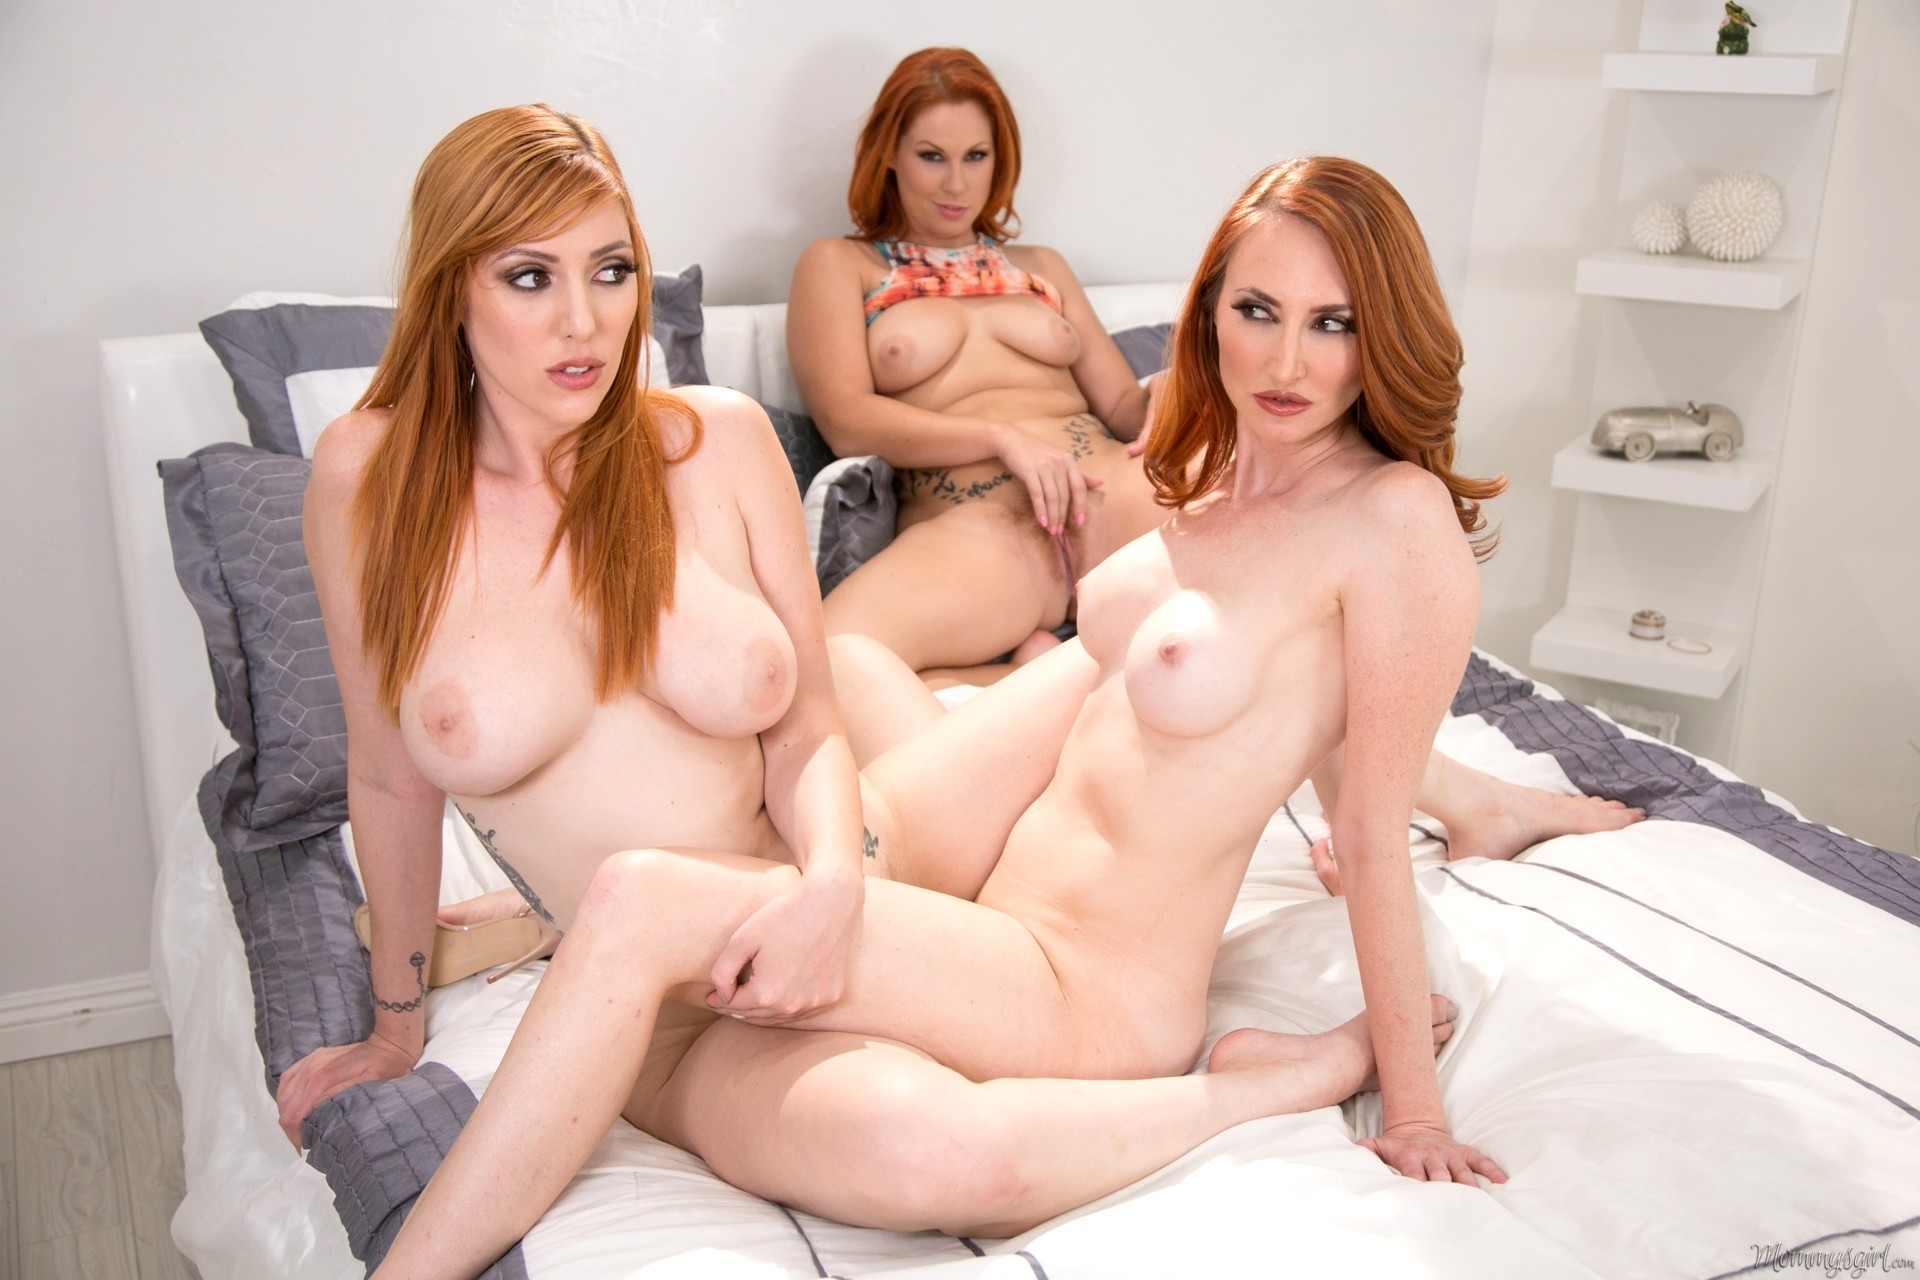 Red hot lauren in lesbian videos